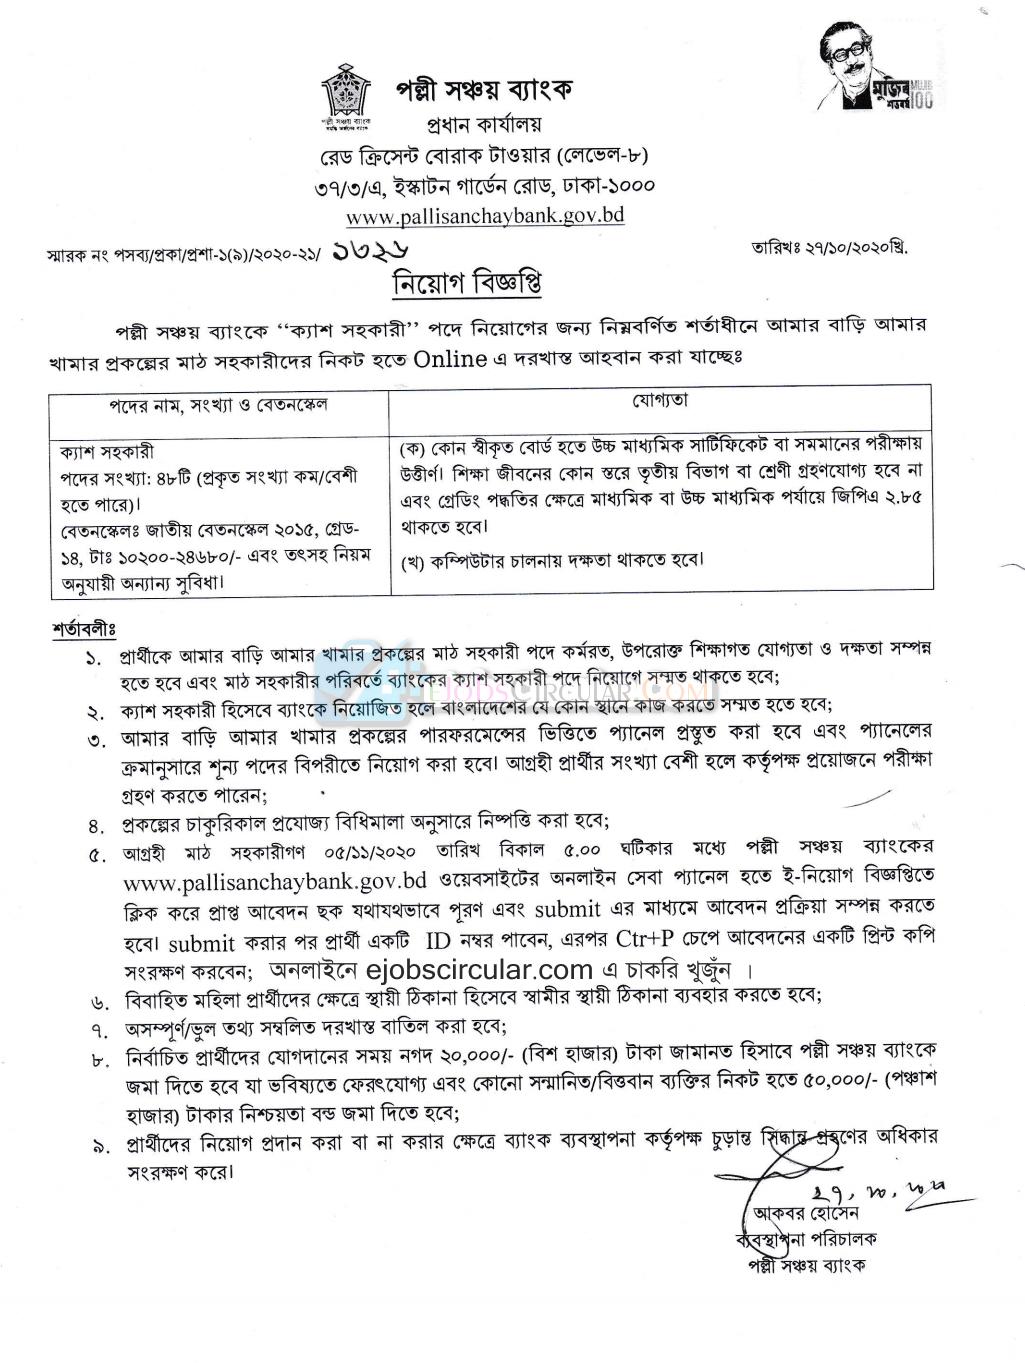 Palli-Sanchay-Bank-Job-Circular-2020-jobs-learninghomebd-com